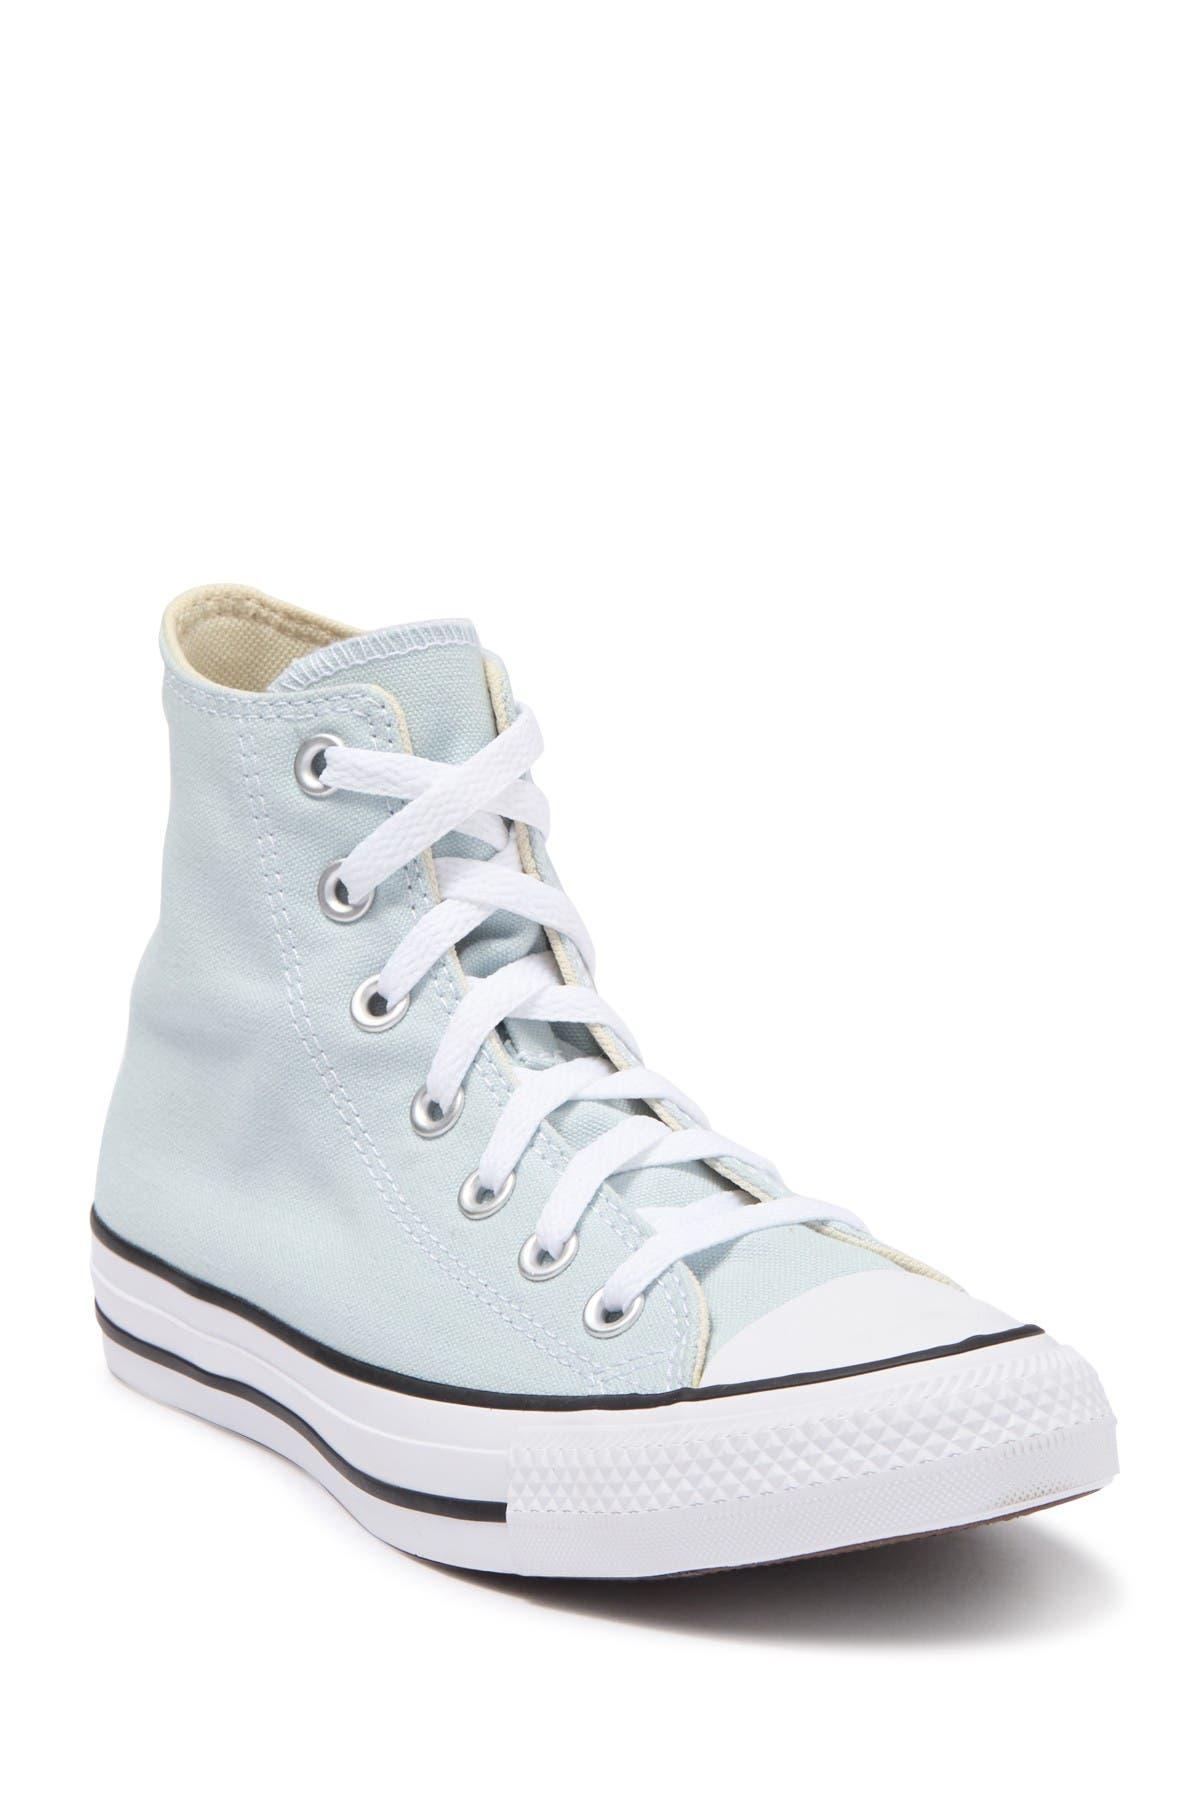 Chuck Taylor All Star High-Top Sneaker